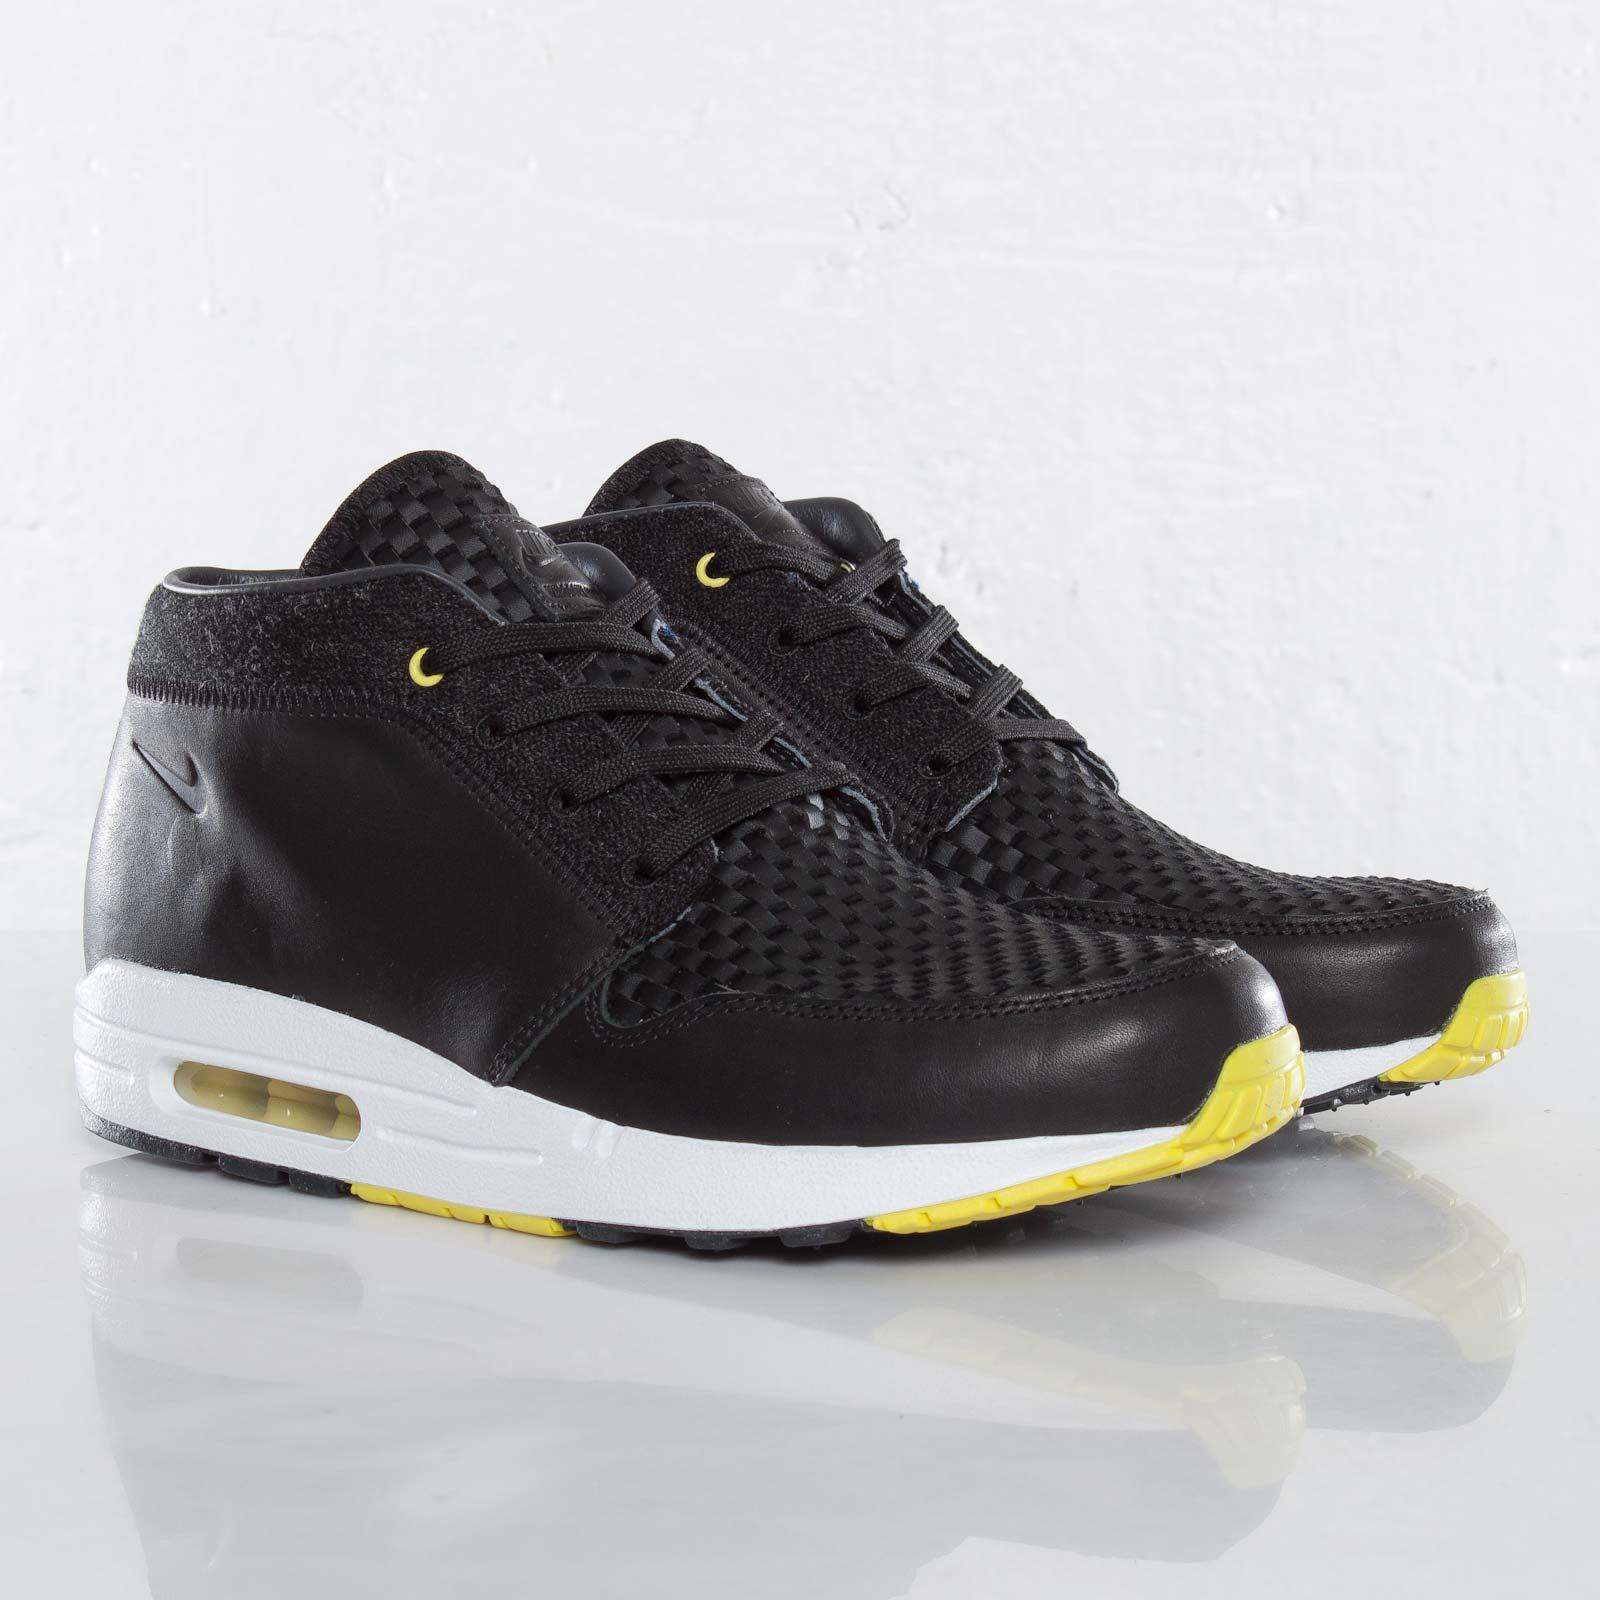 Nike Wardour Max 1 Prm NRG 556091 007 Sneakersnstuff